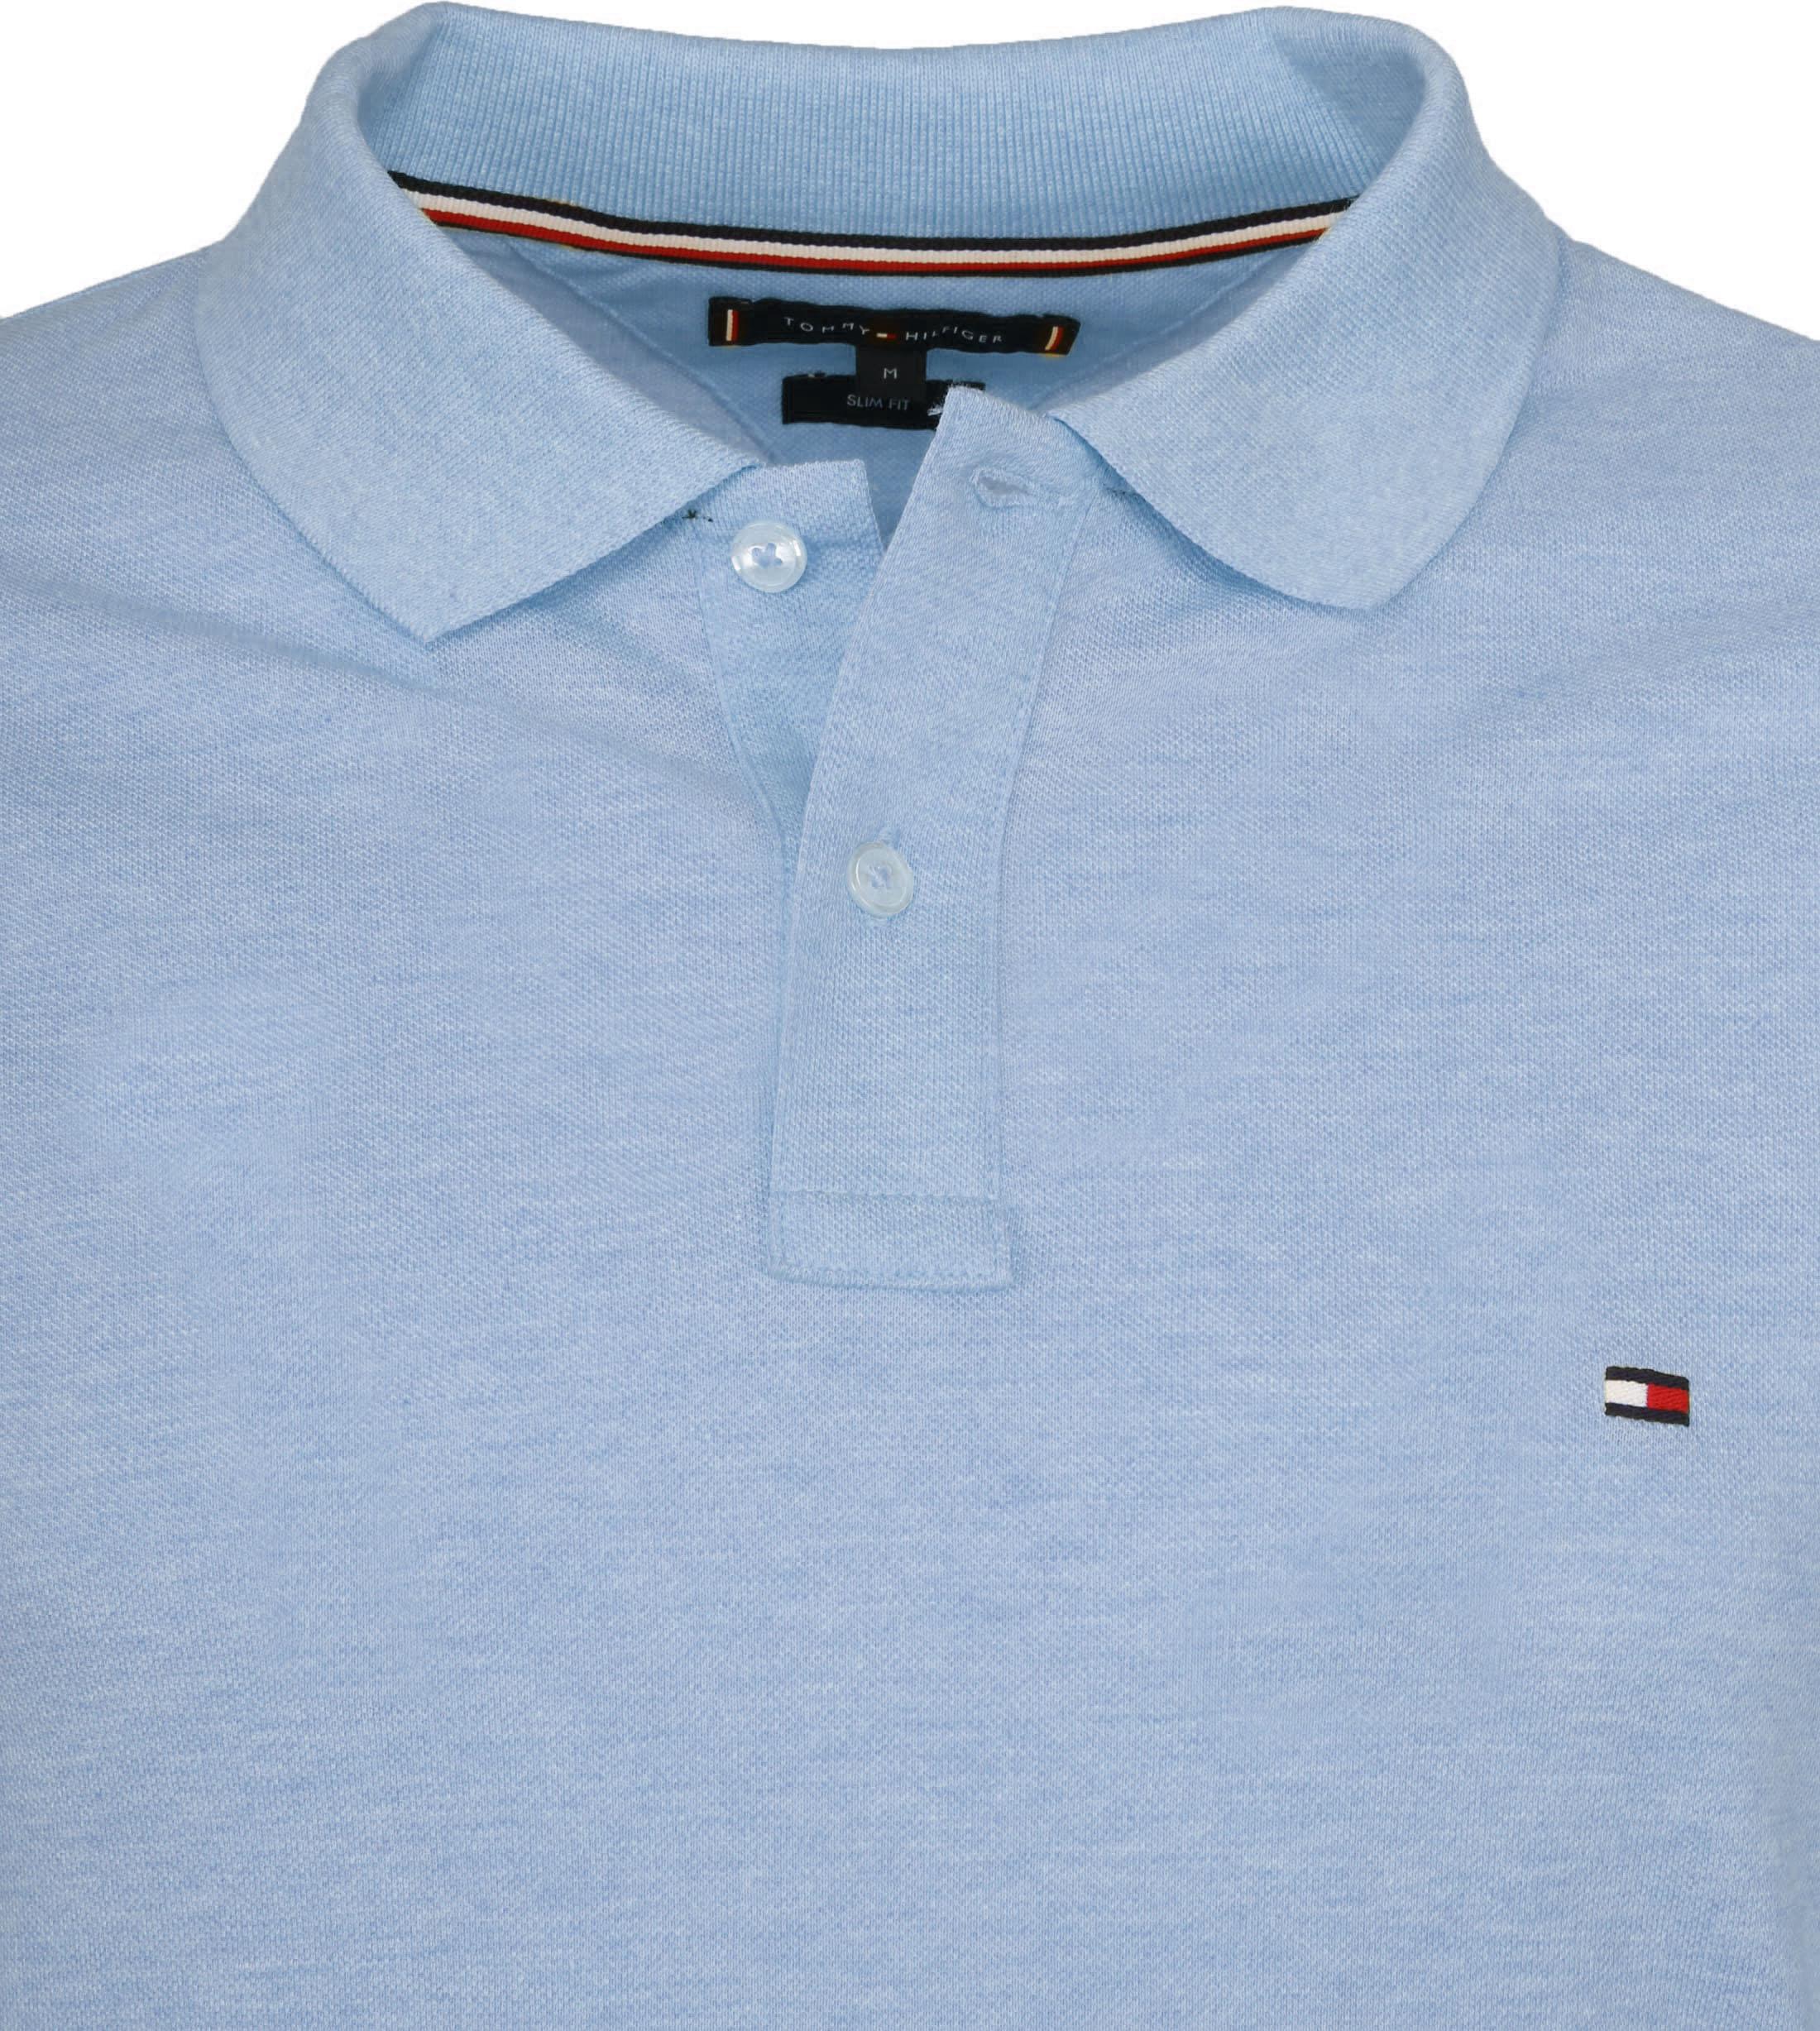 Tommy Hilfiger Poloshirt Sweat Blauw